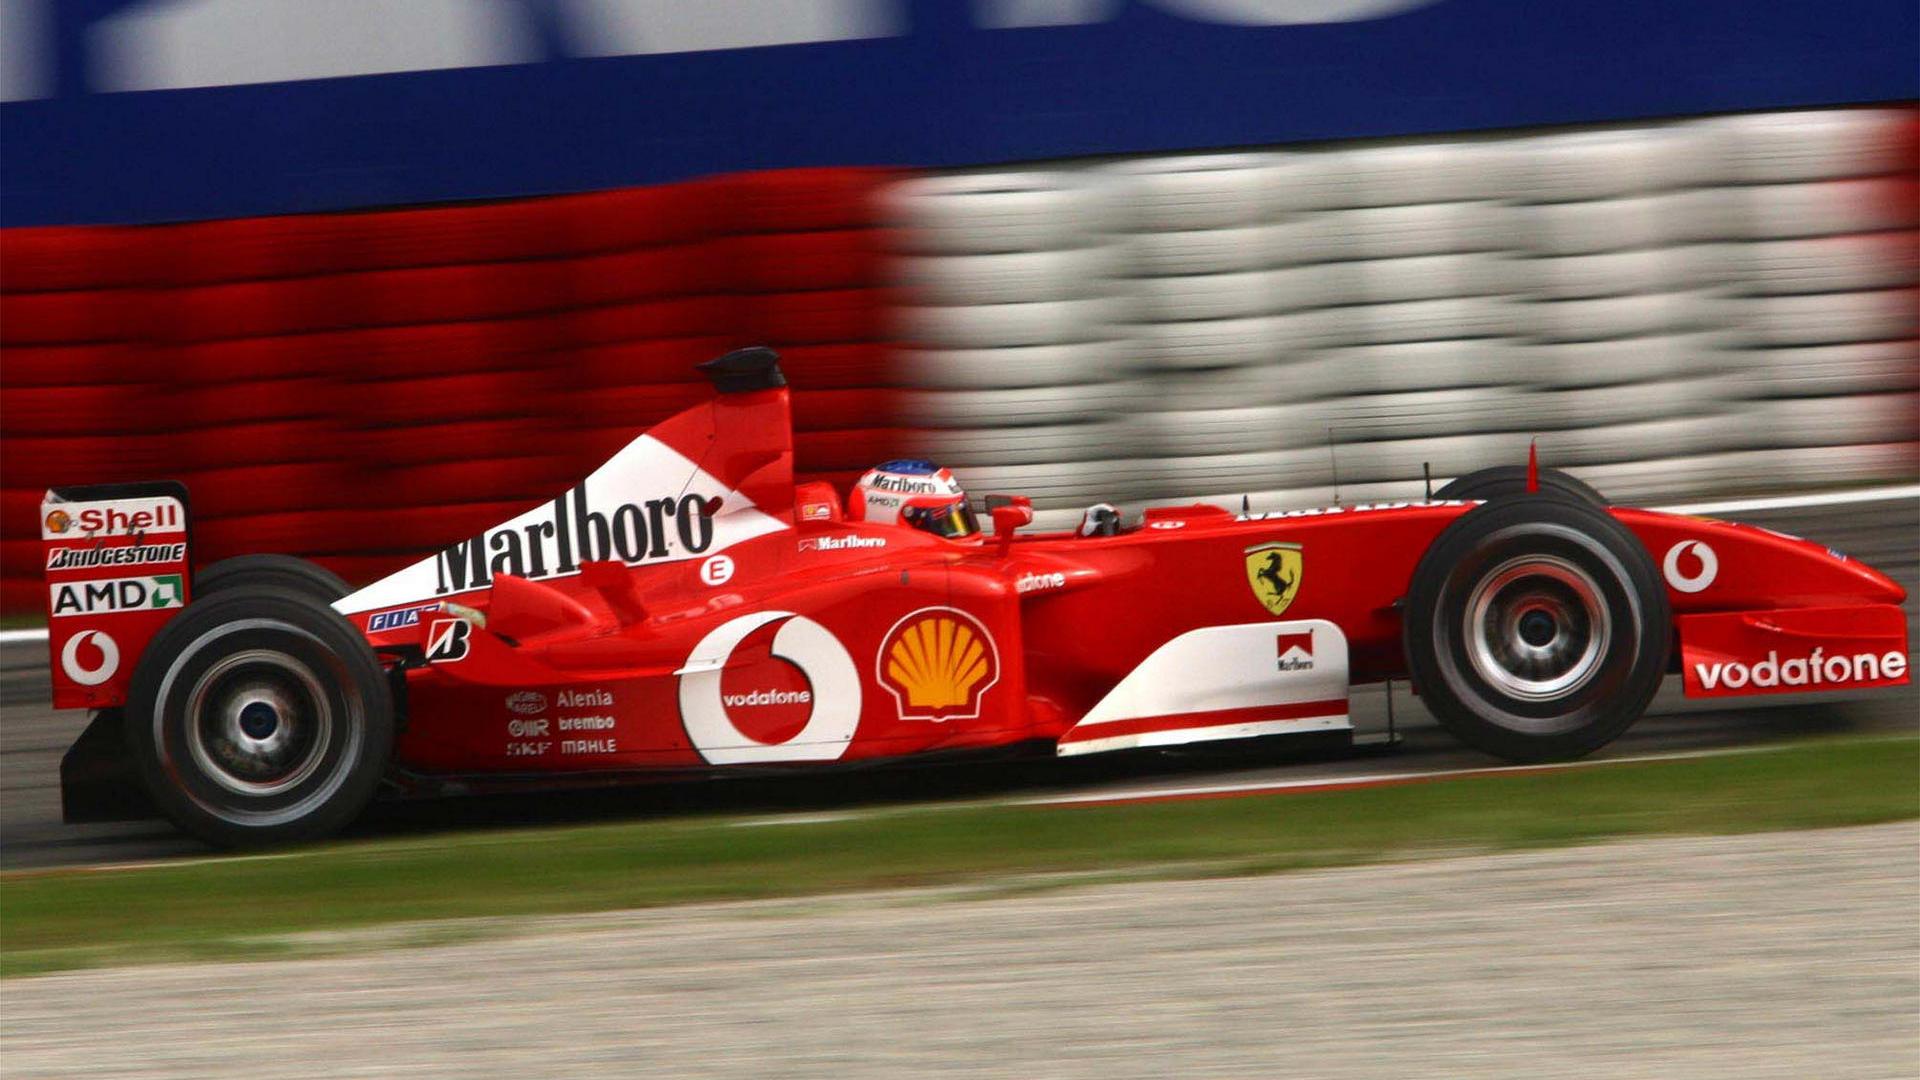 Hd Wallpapers 2002 Formula 1 Grand Prix Of Italy F1